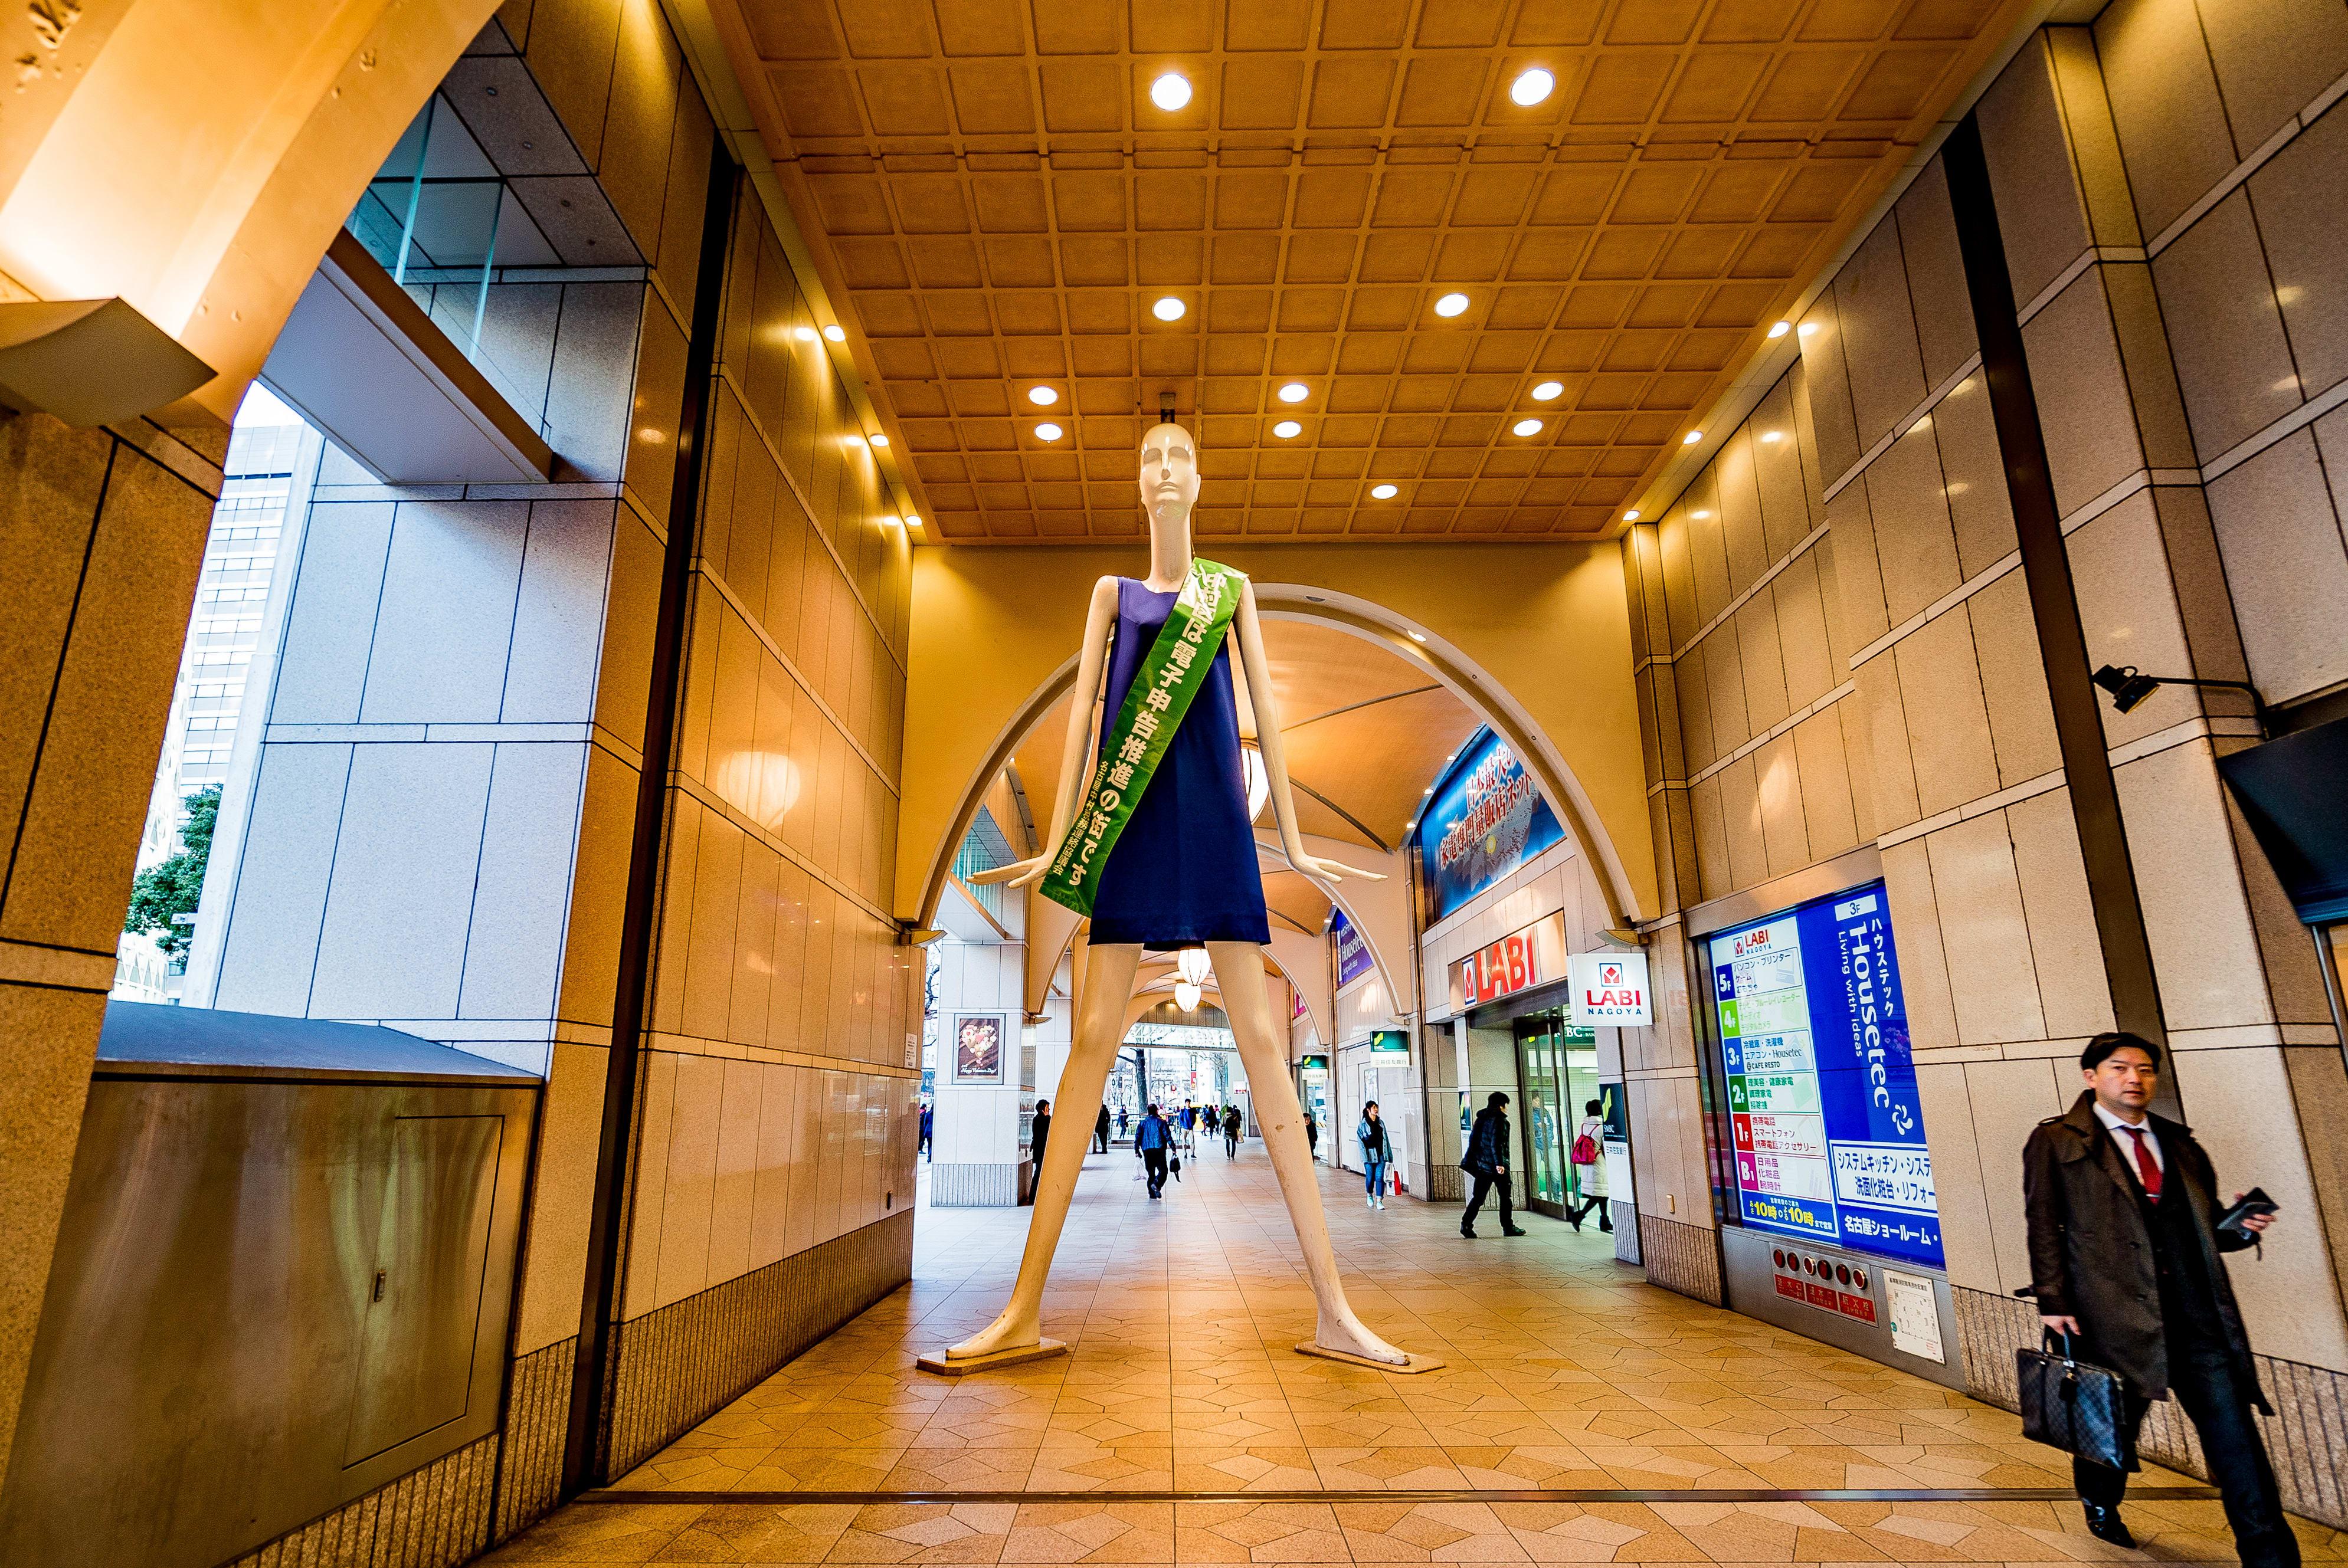 NANA大人形為名古屋的知名地標,他身上的衣服還會隨著季節或百貨活動改變,經過的朋友一定要拍啊!